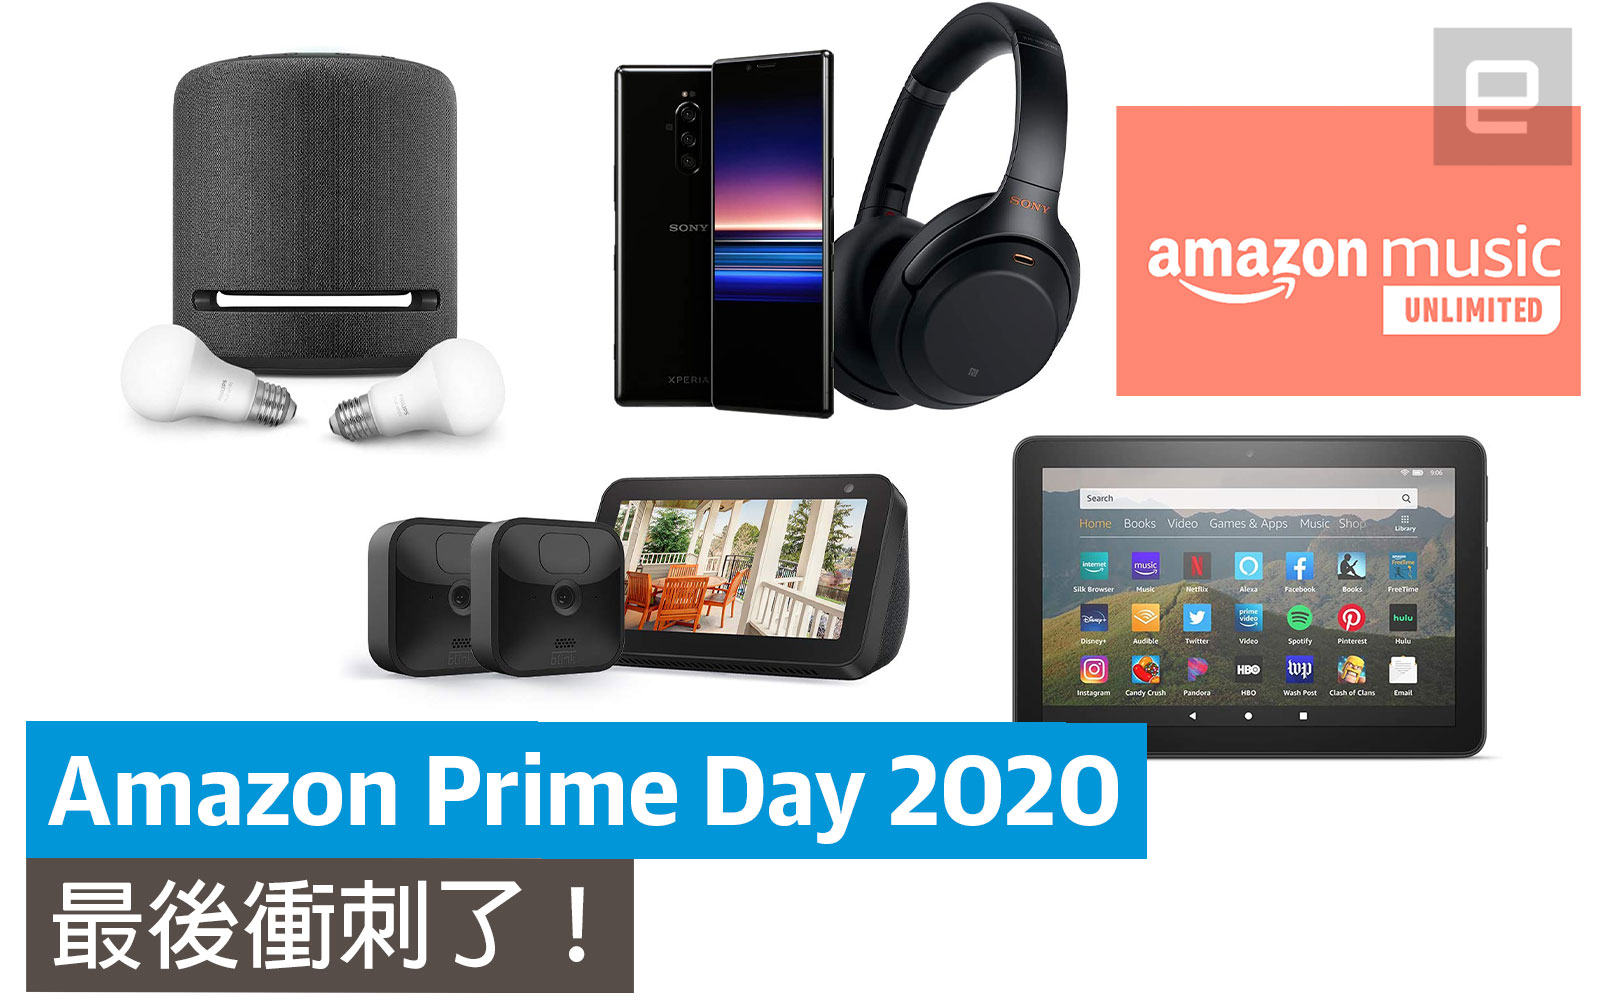 Amazon Prime Day last chance